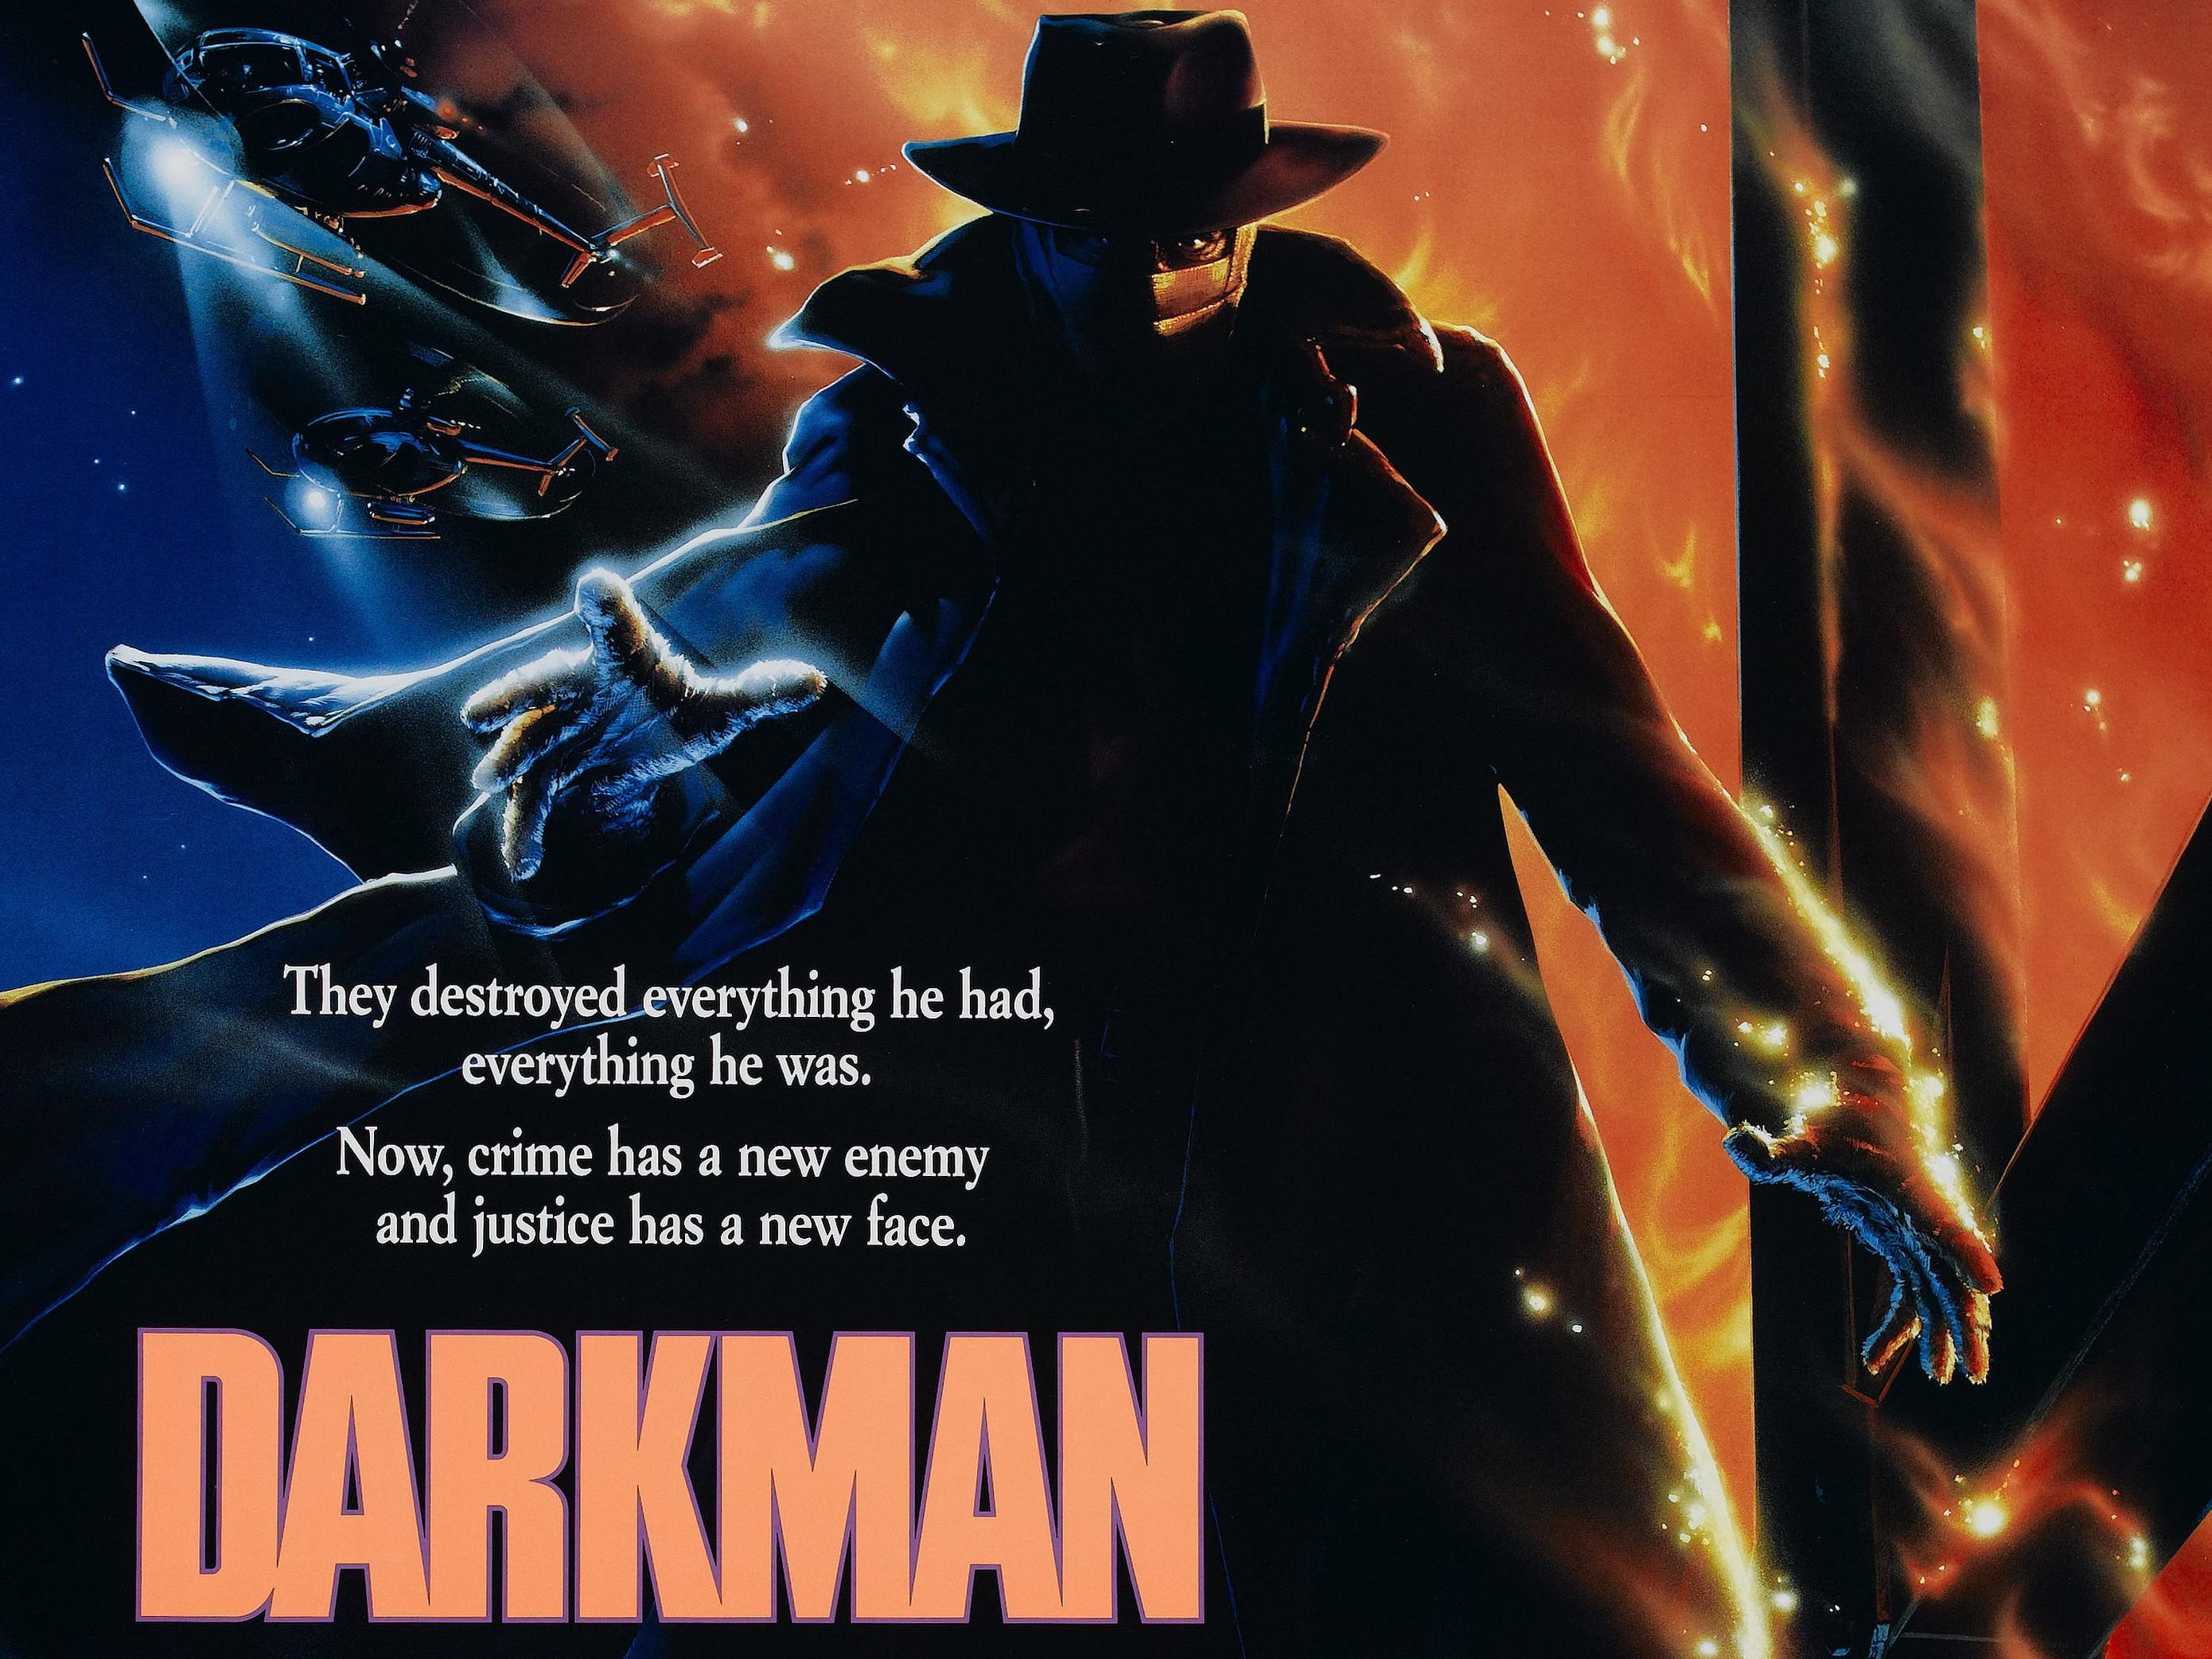 Shelf Wallpaper Hd On This Day In Horror History Sam Raimi S Darkman